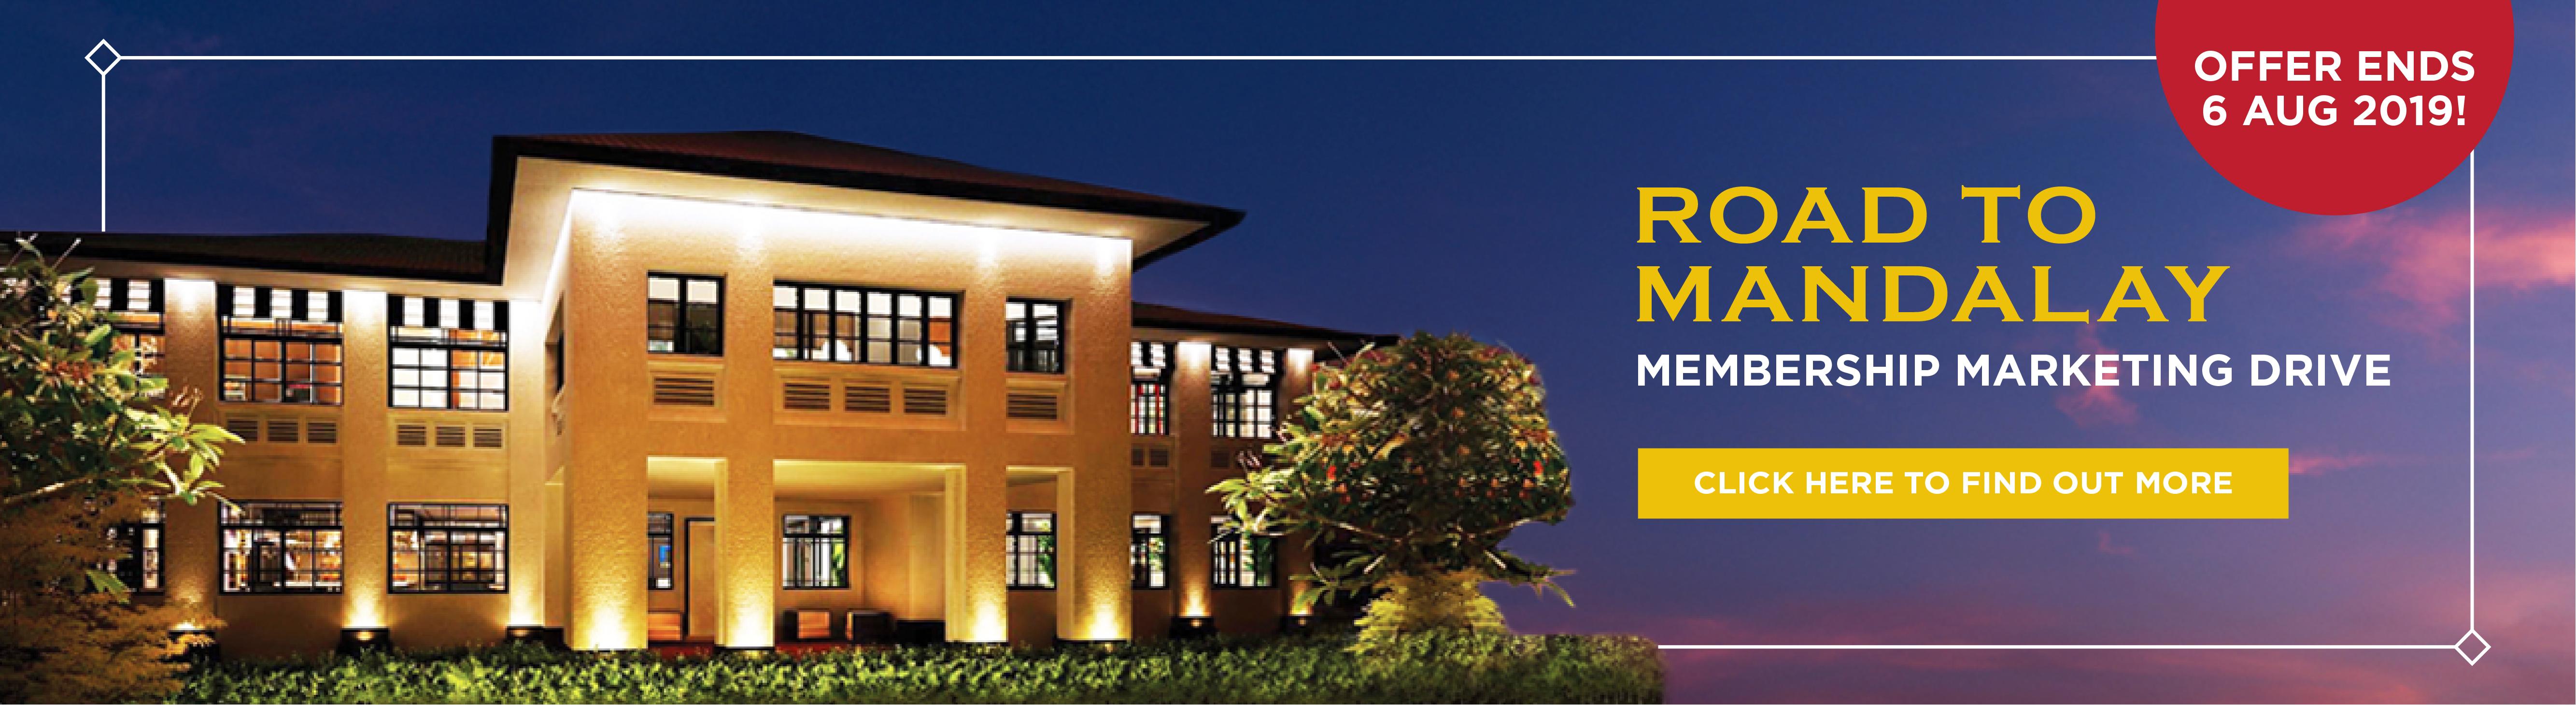 The National University of Singapore Society (NUSS)